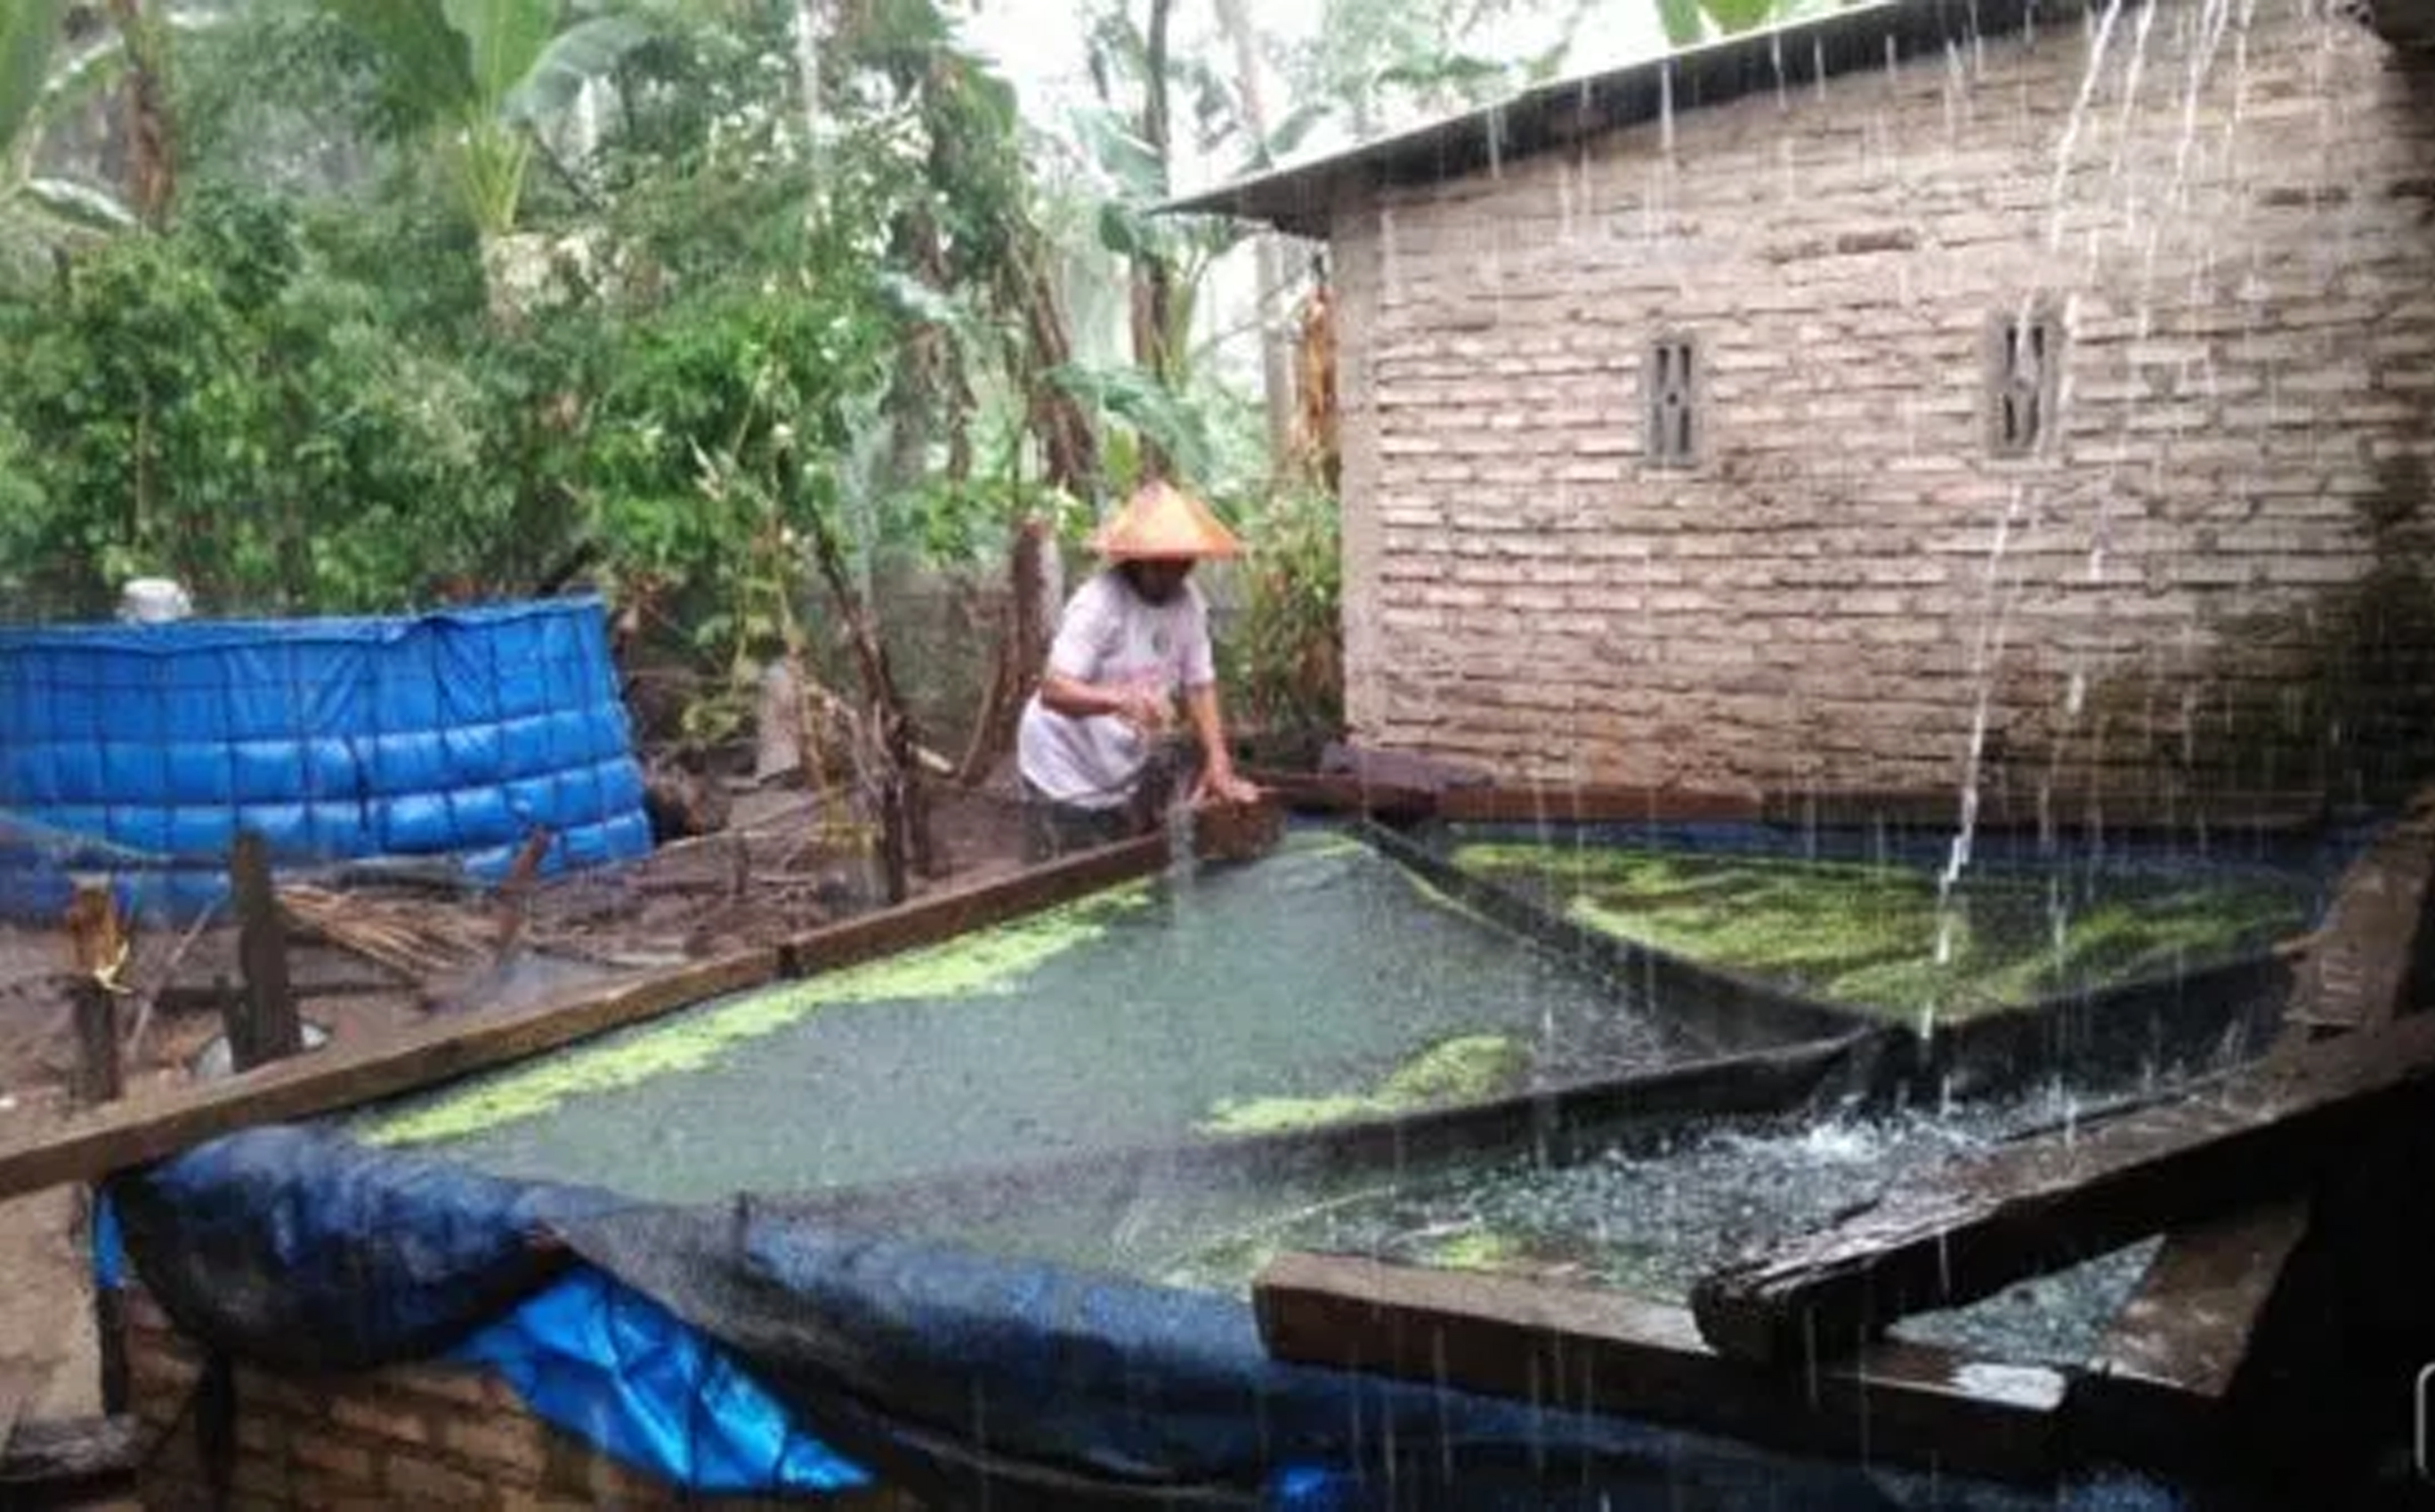 Dampak Air Hujan Bagi Ikan Lele Dan Cara Mengatasinya Kampustani Com